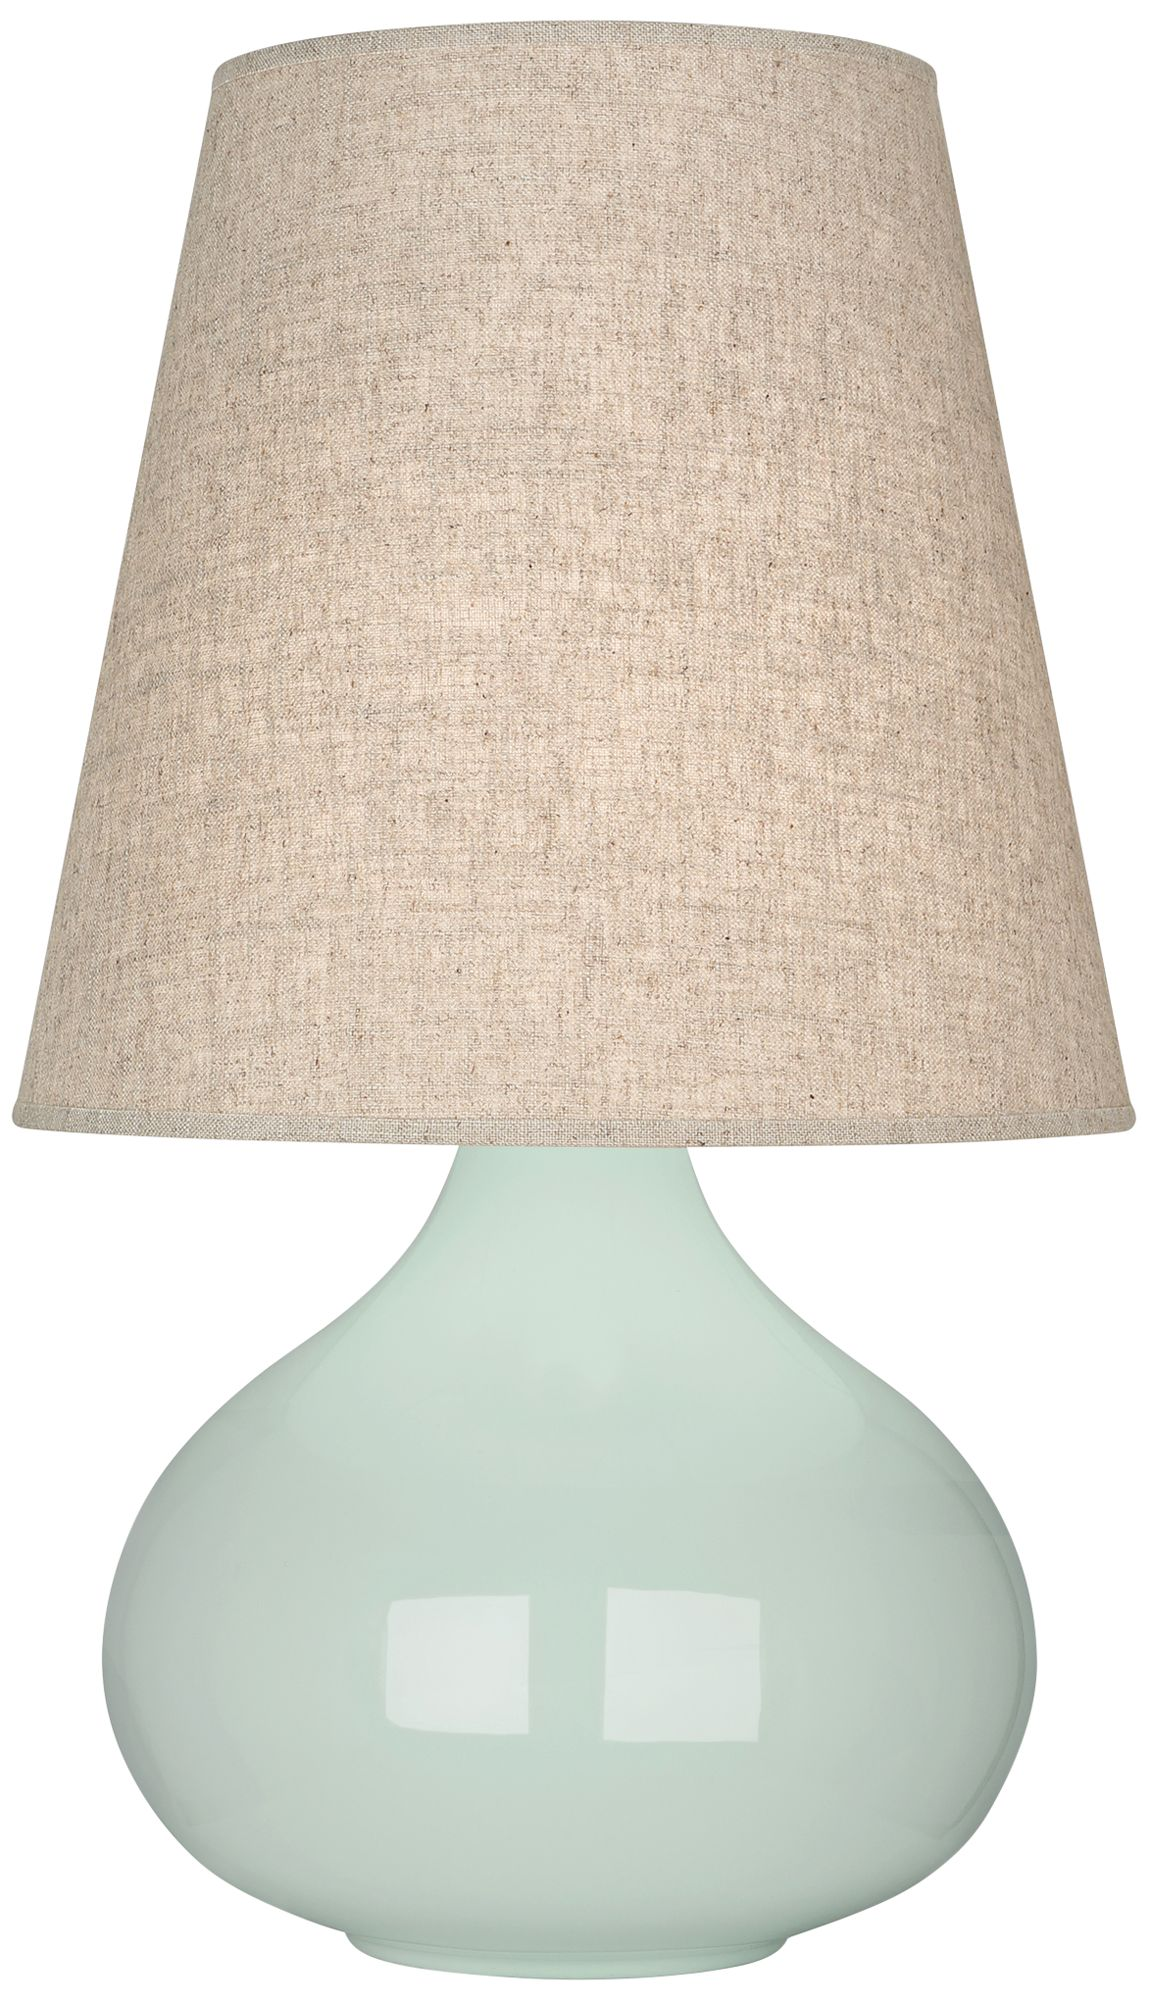 Robert Abbey June Celadon Table Lamp With Buff Linen Shade